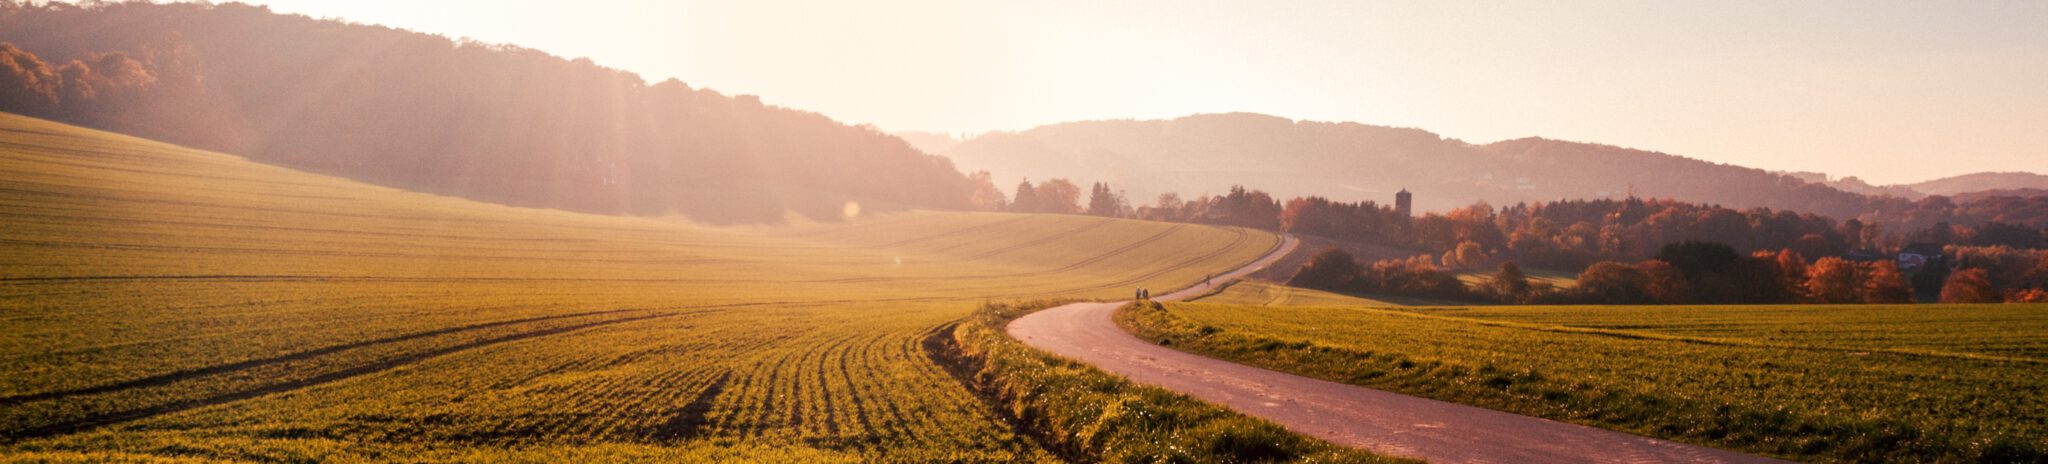 Straße_Sonnenuntergang_Urlaub